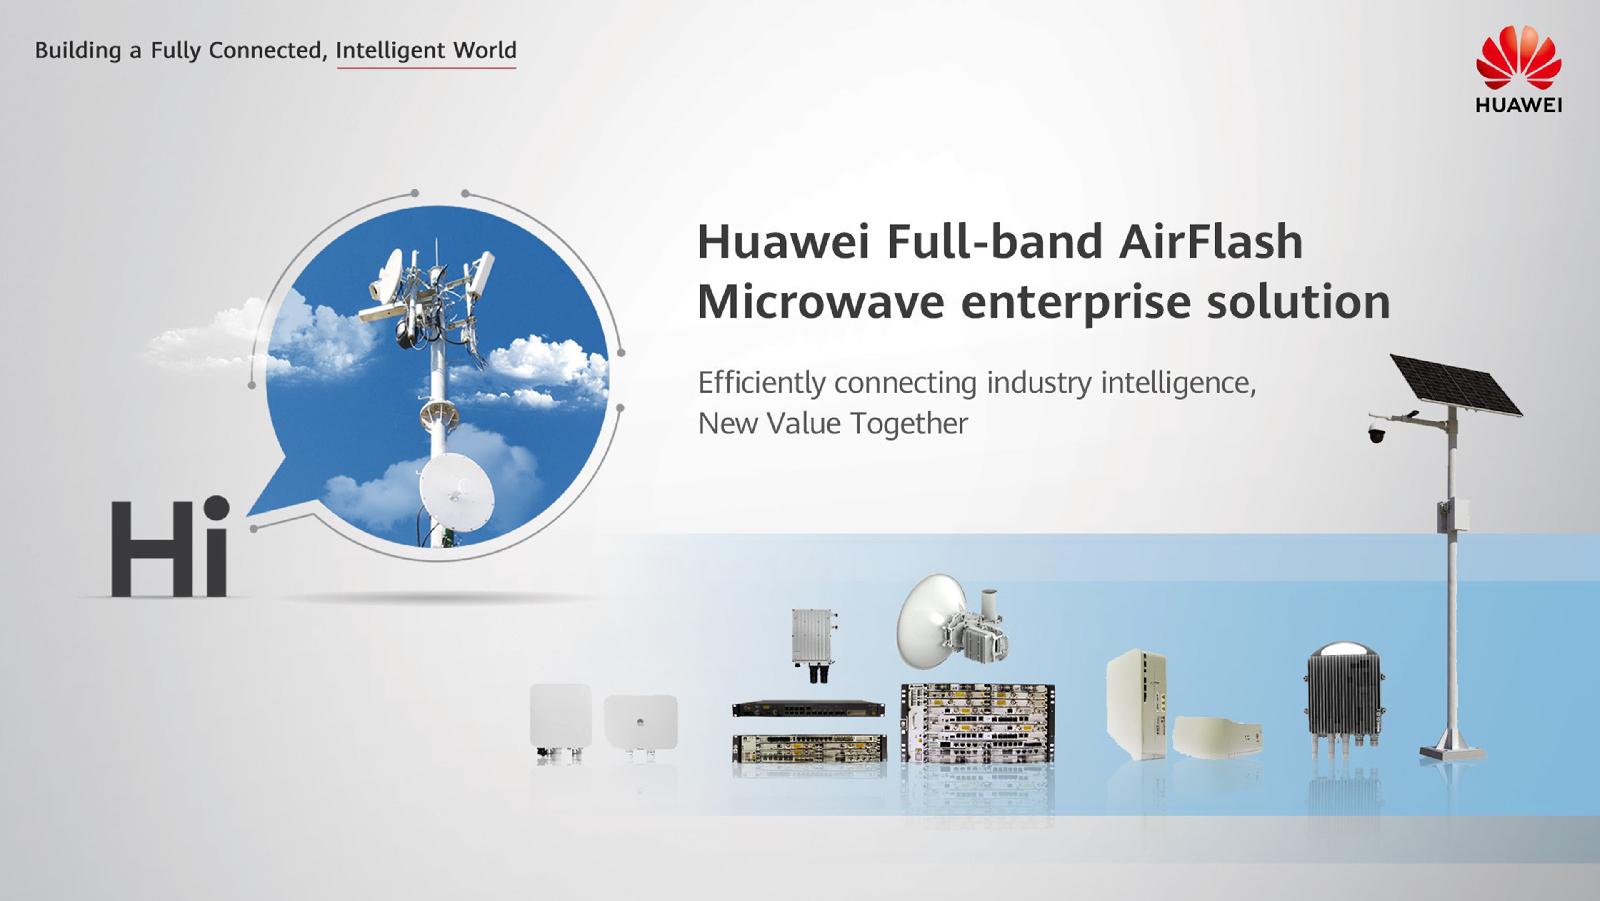 Huawei เปิดตัว AirFlash Microwave โซลูชันเชื่อมต่อไร้สายระบบไมโครเวฟเชื่อมต่อความชาญฉลาดของอุตสาหกรรม สร้างคุณค่าใหม่ร่วมกัน